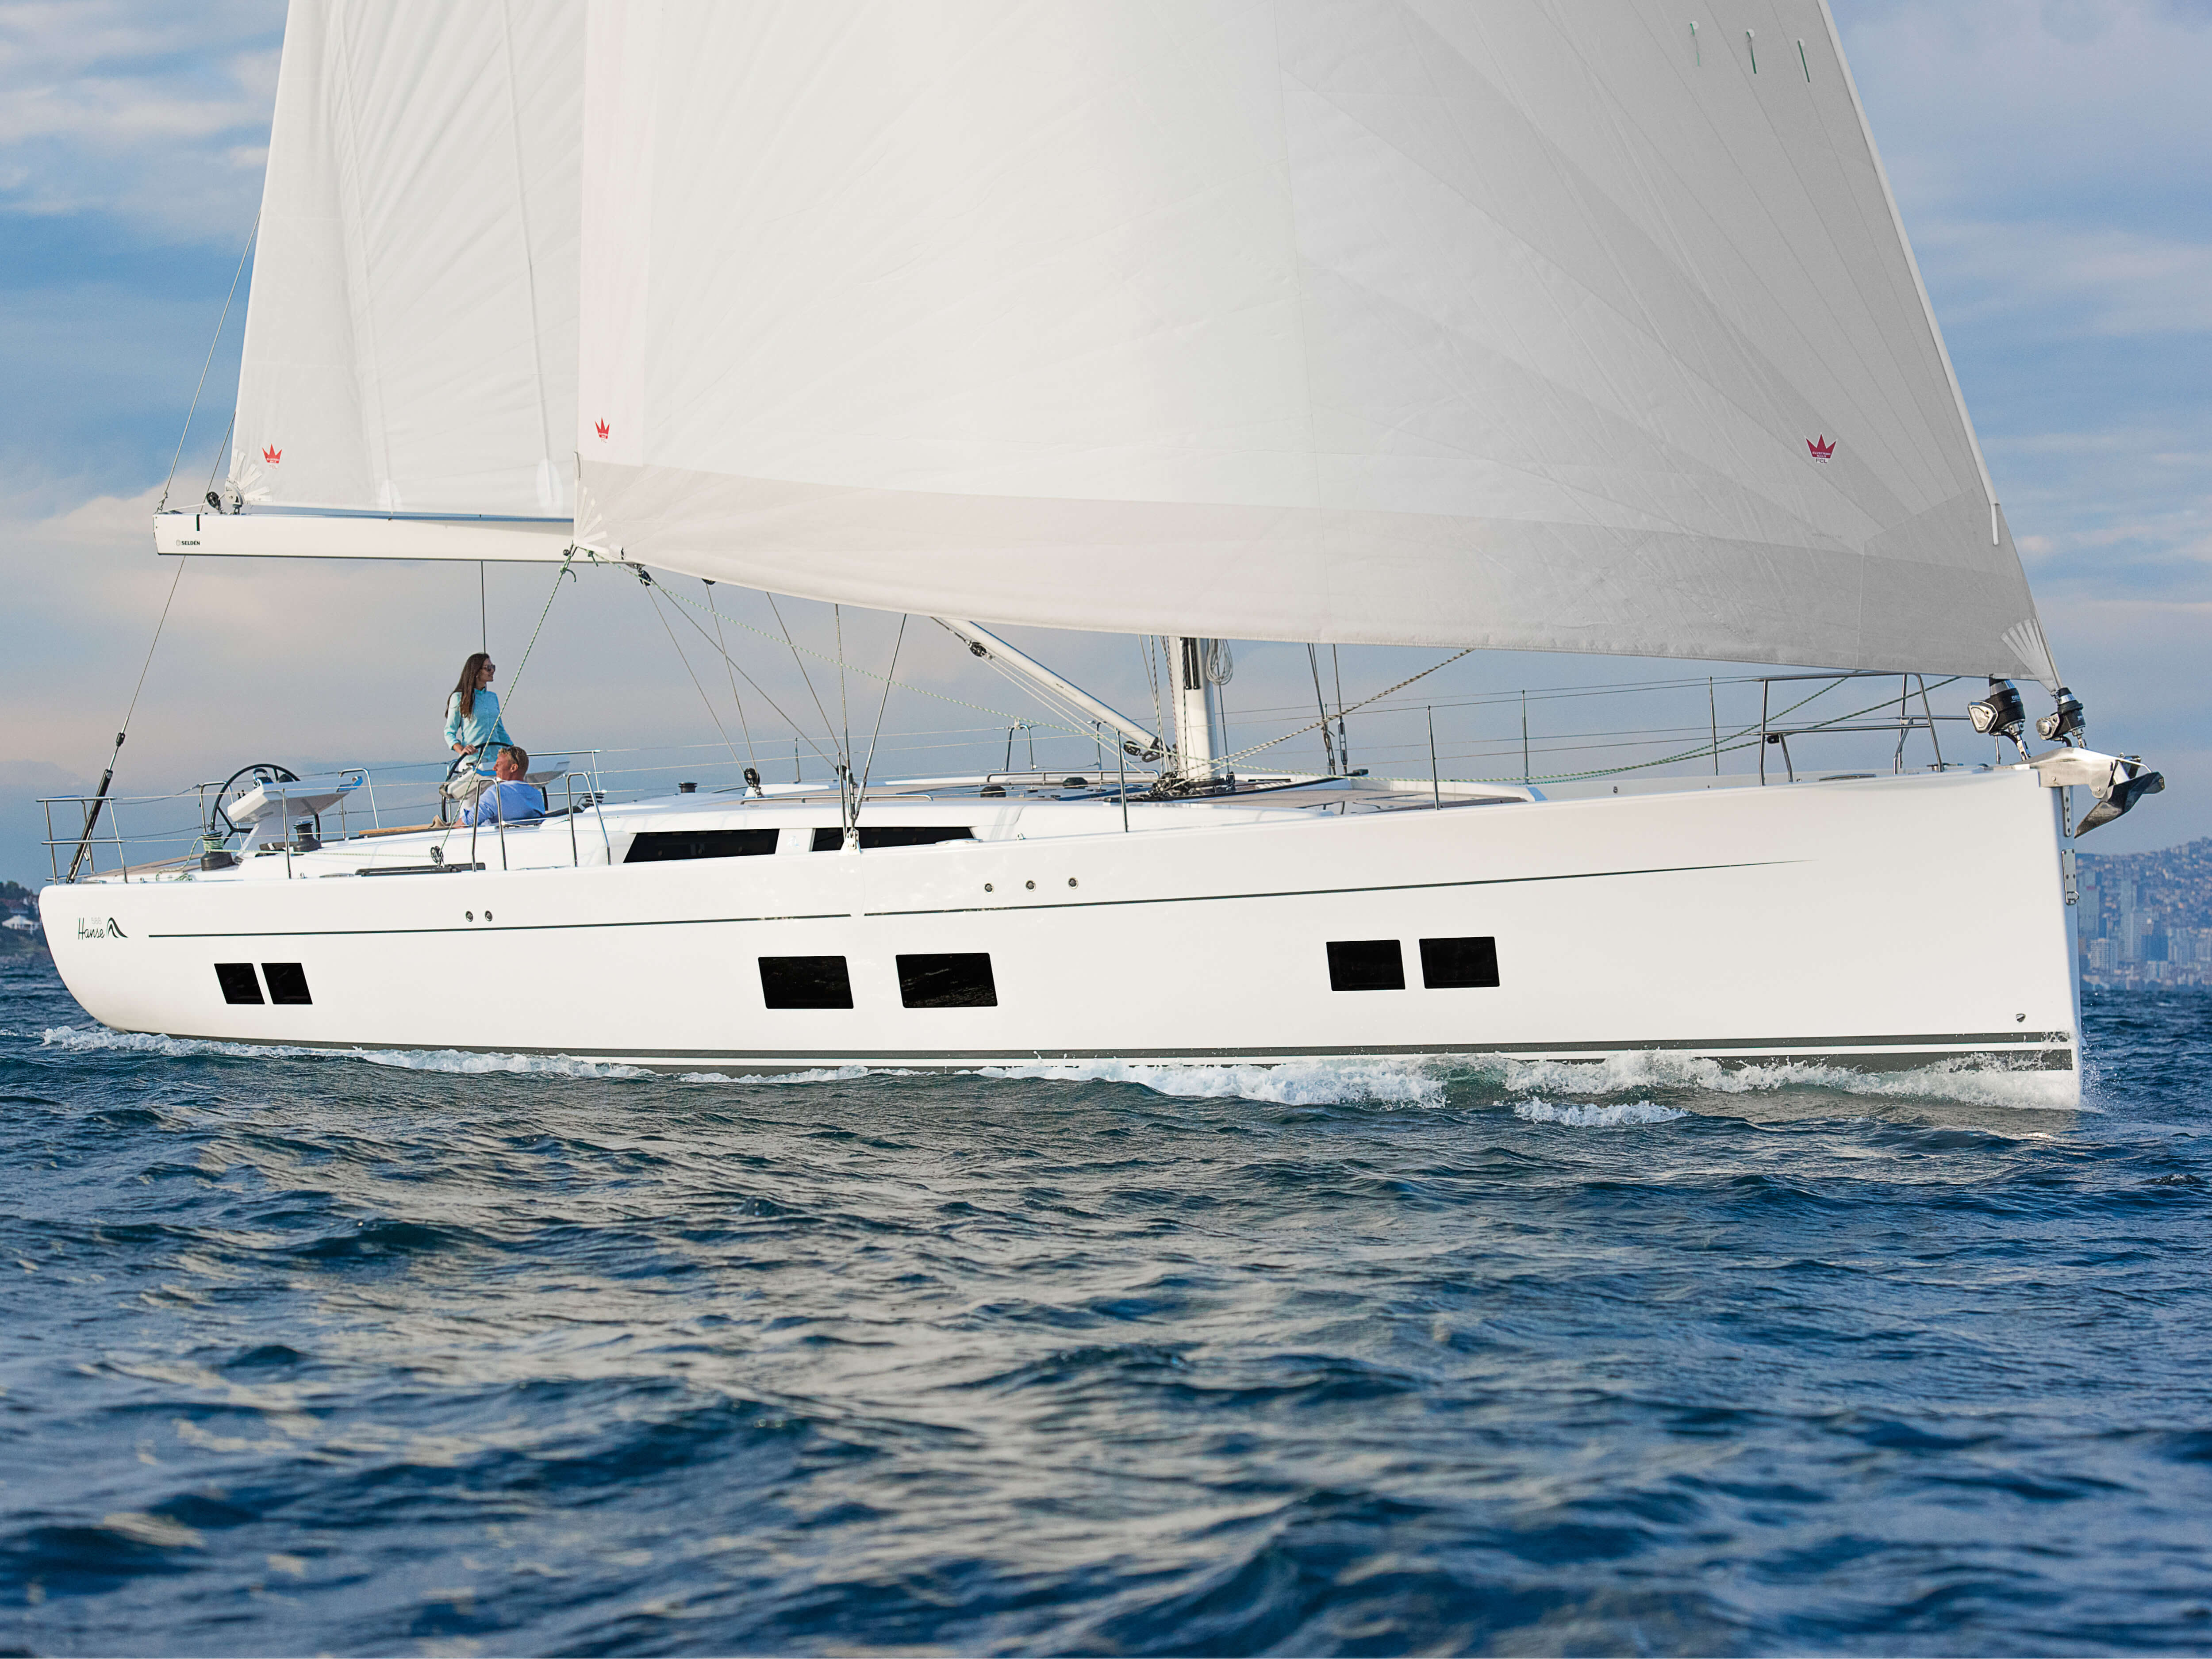 Hanse 588 Exterior Sailing | mainsail, Genoa, cockpit, double steering wheel, rail | Hanse